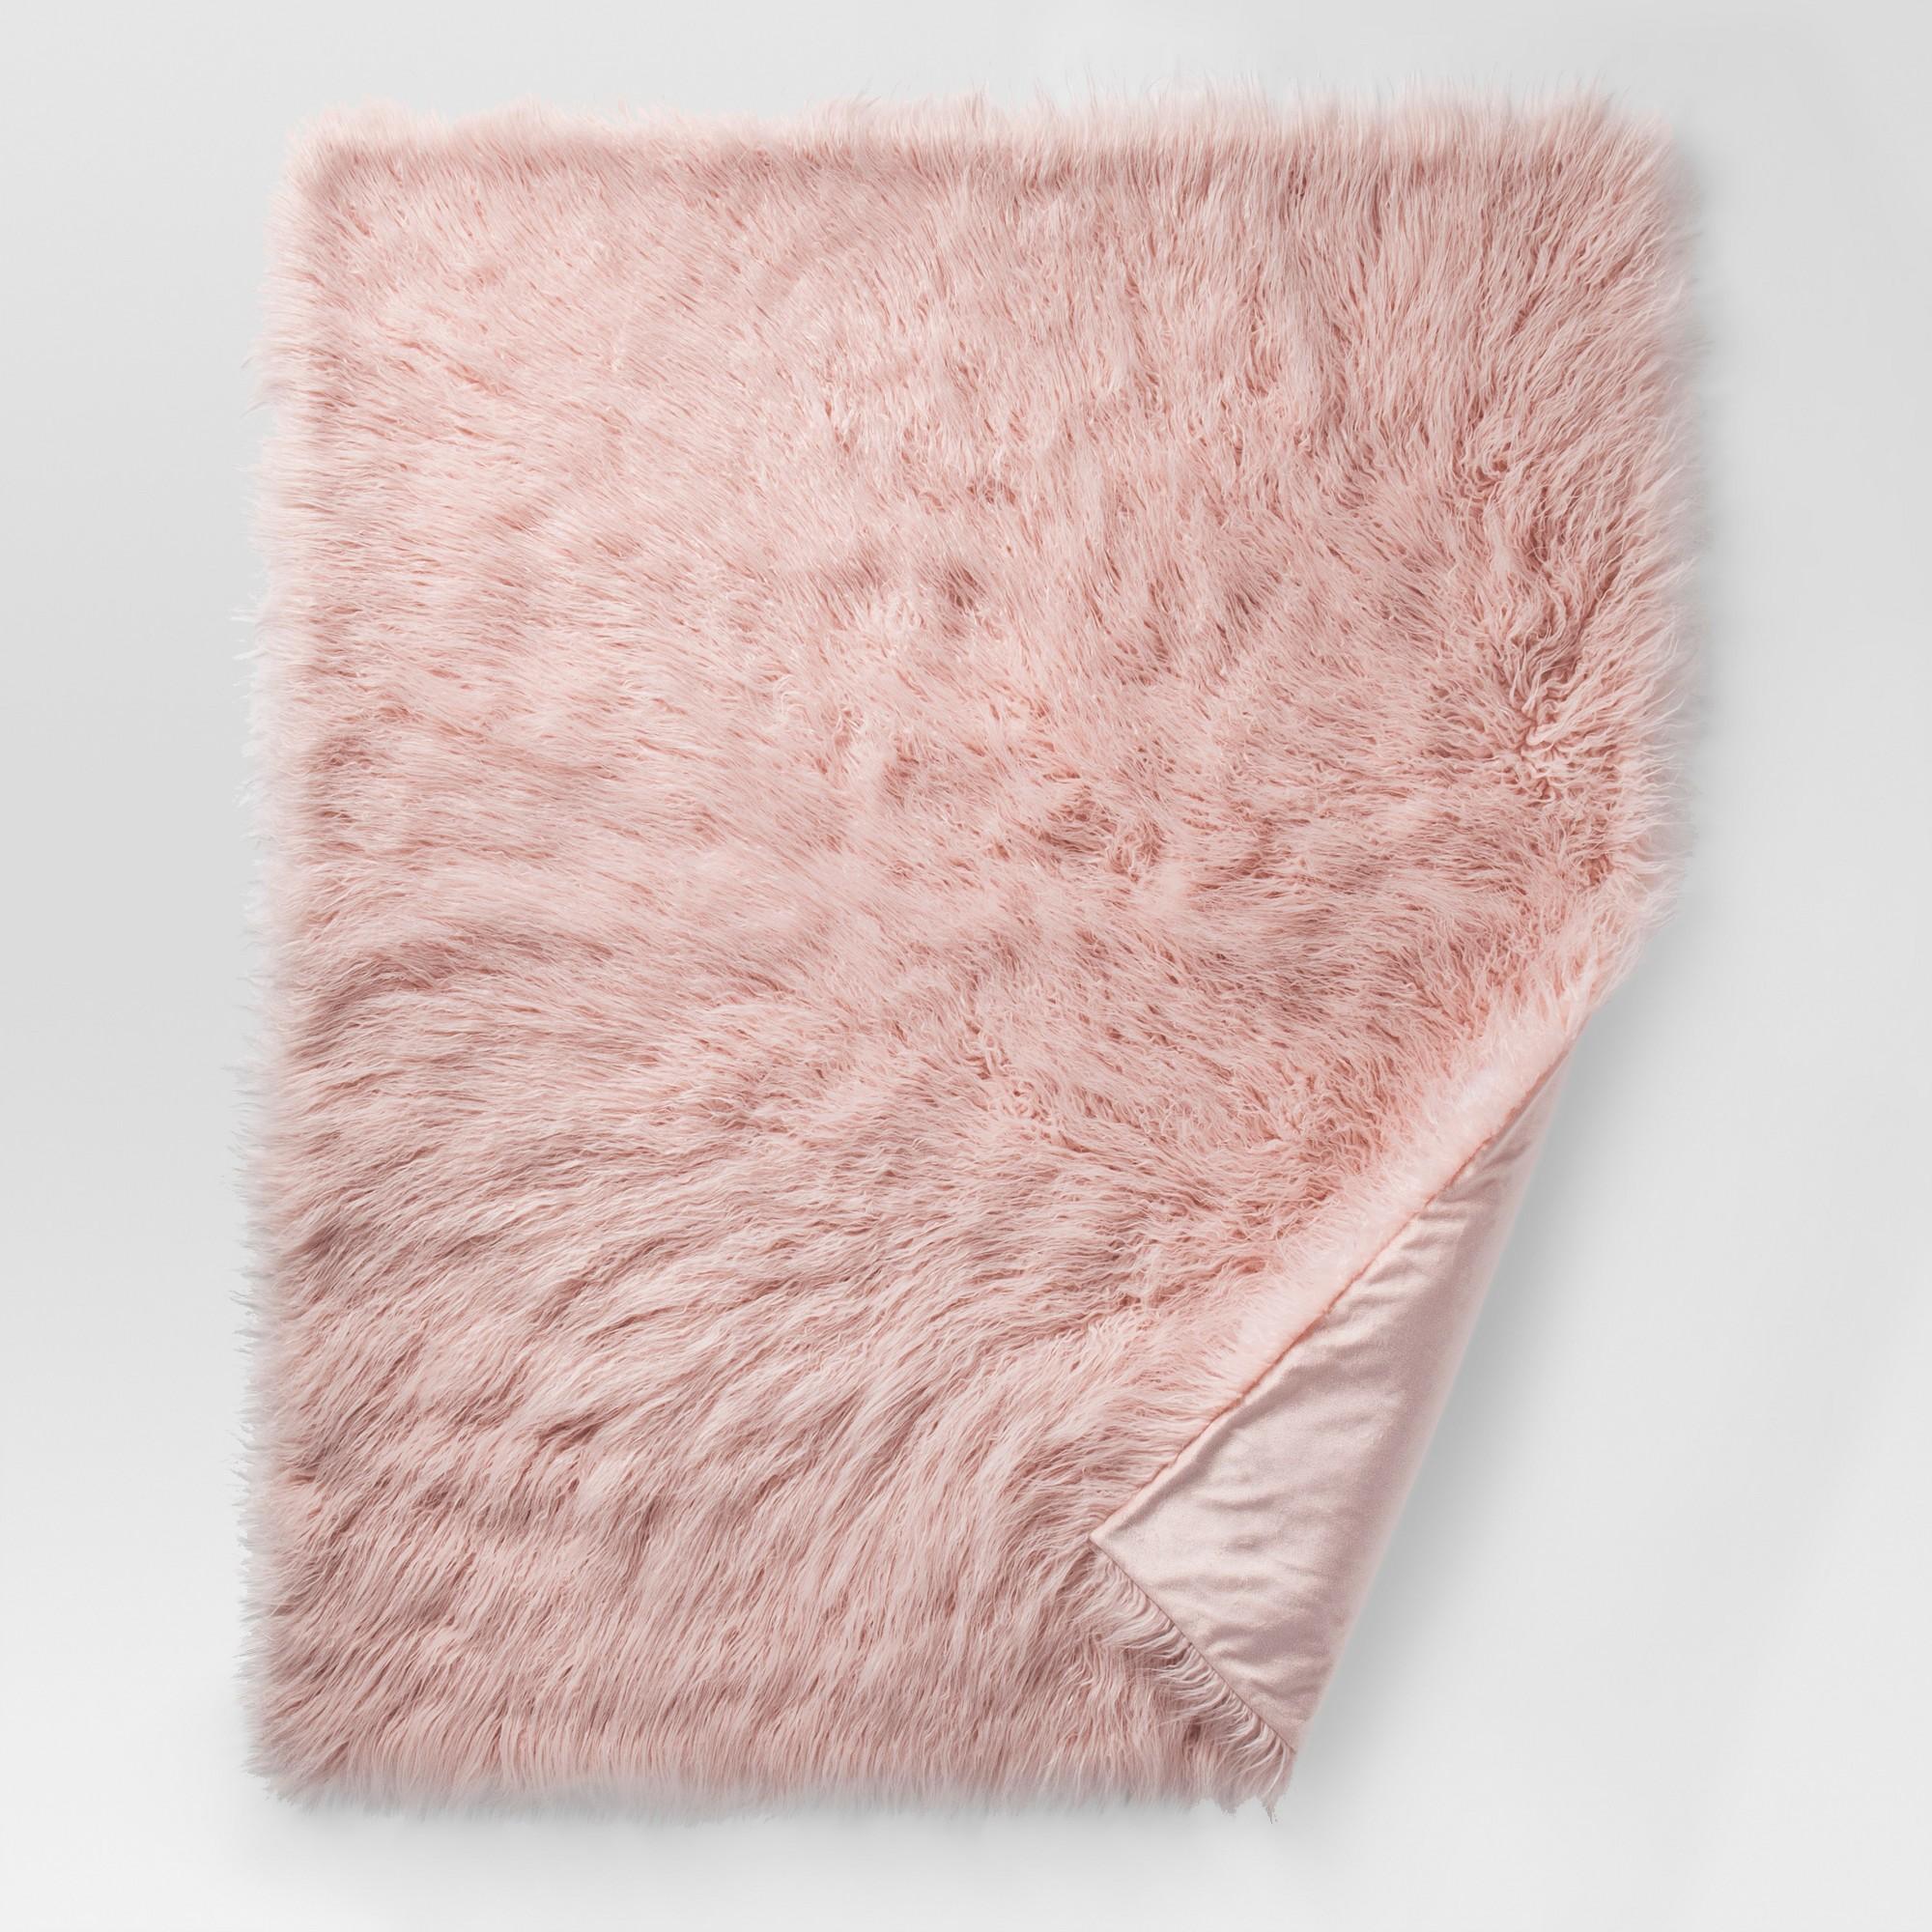 Pink Mongolian Faux Fur Throw Blankets 50 X60 Project 62 Fur Throw Blanket Faux Fur Throw Faux Fur Throw Blanket